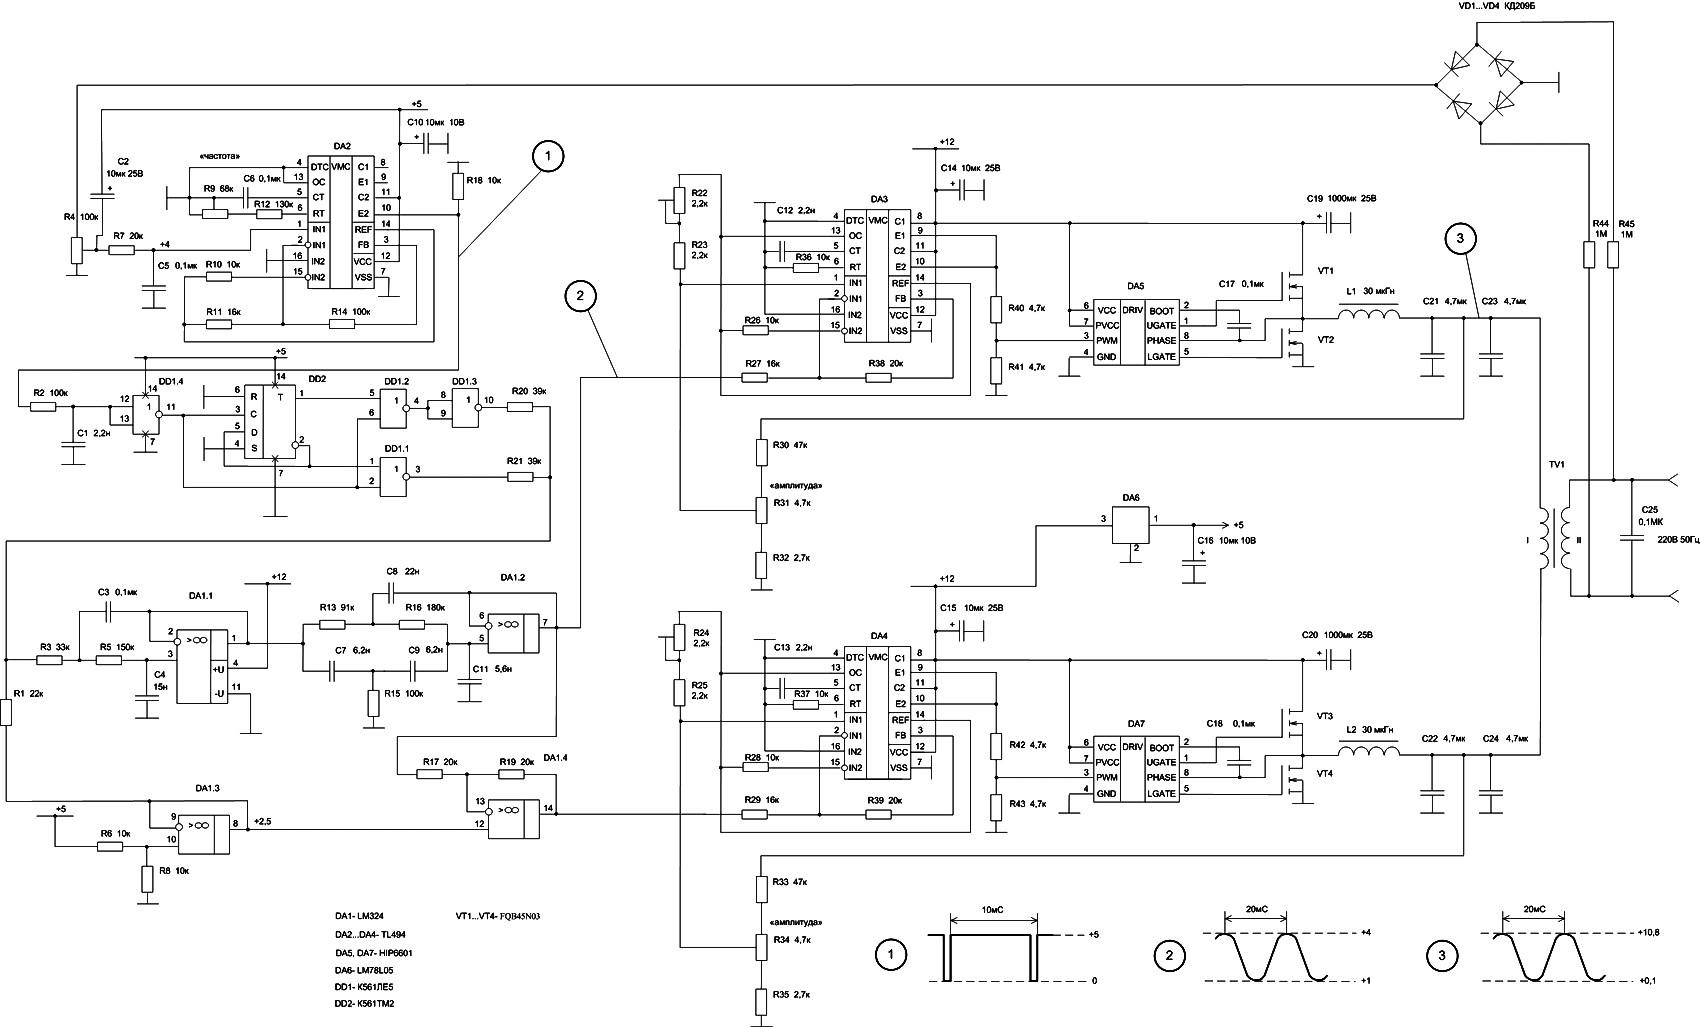 220v to 12v transformer wiring diagram freightliner m2 schematics 12 converter with sine output power supply circuits